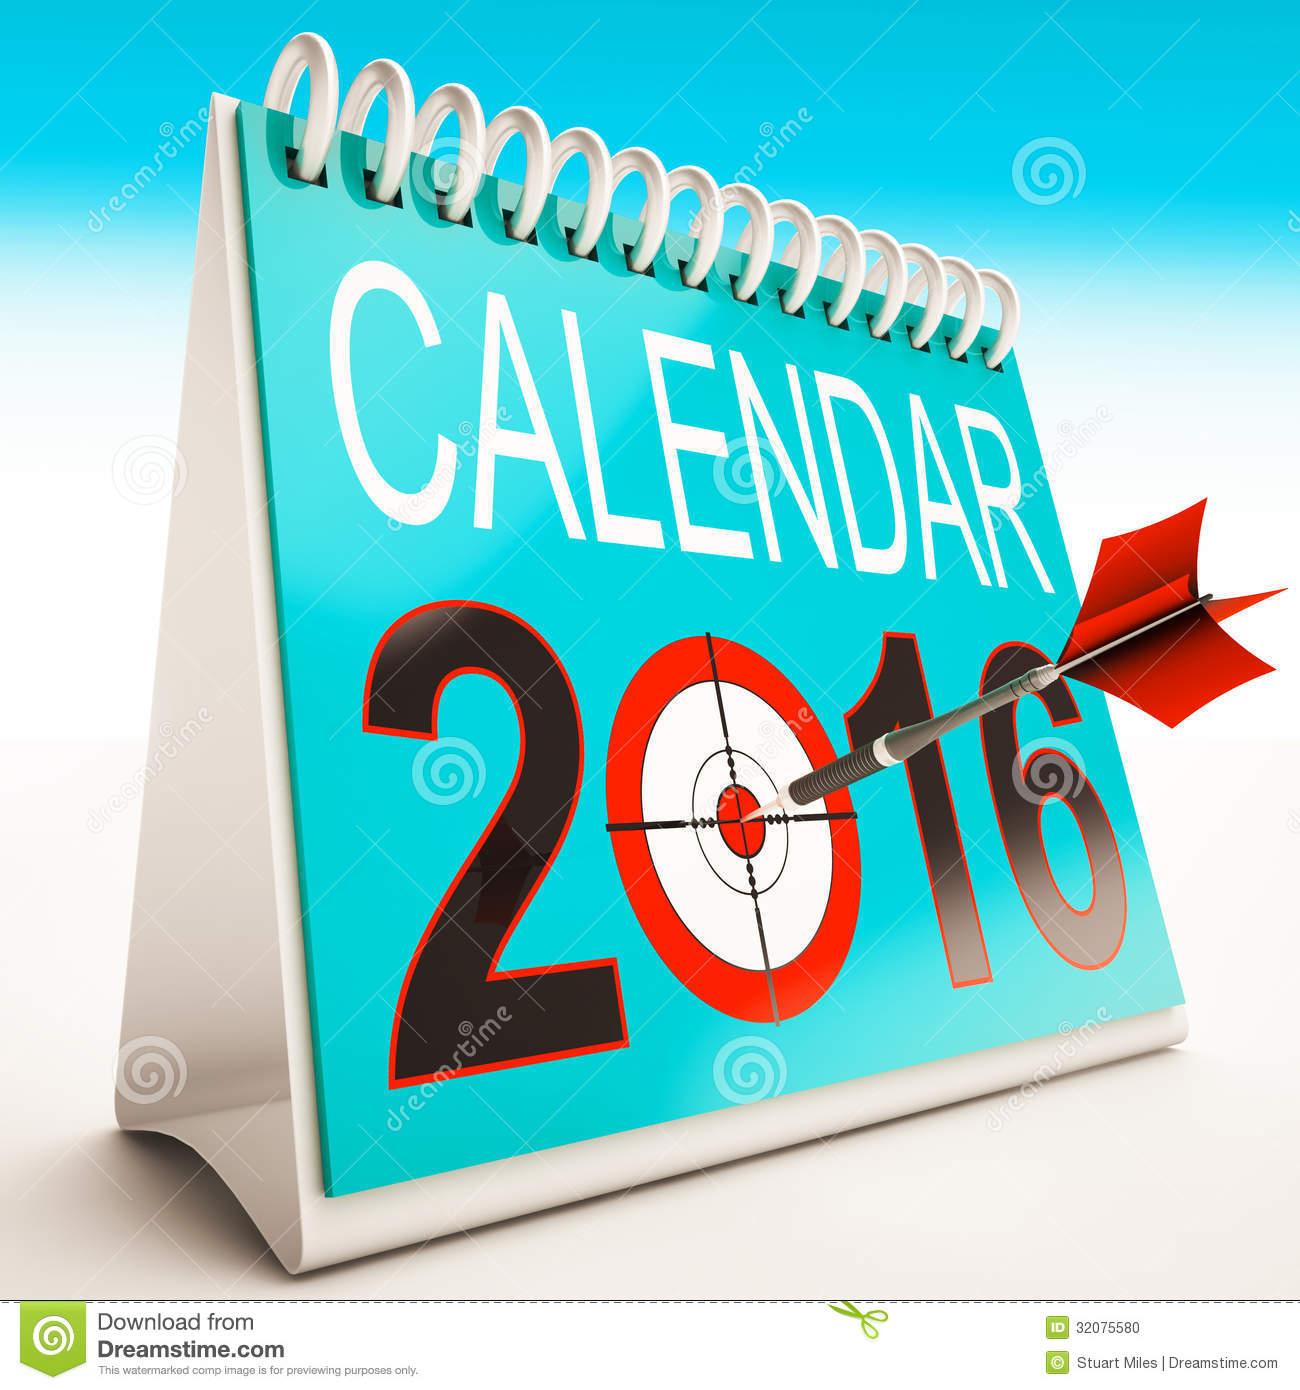 Calendar clipart 2016 - ClipartFest stock